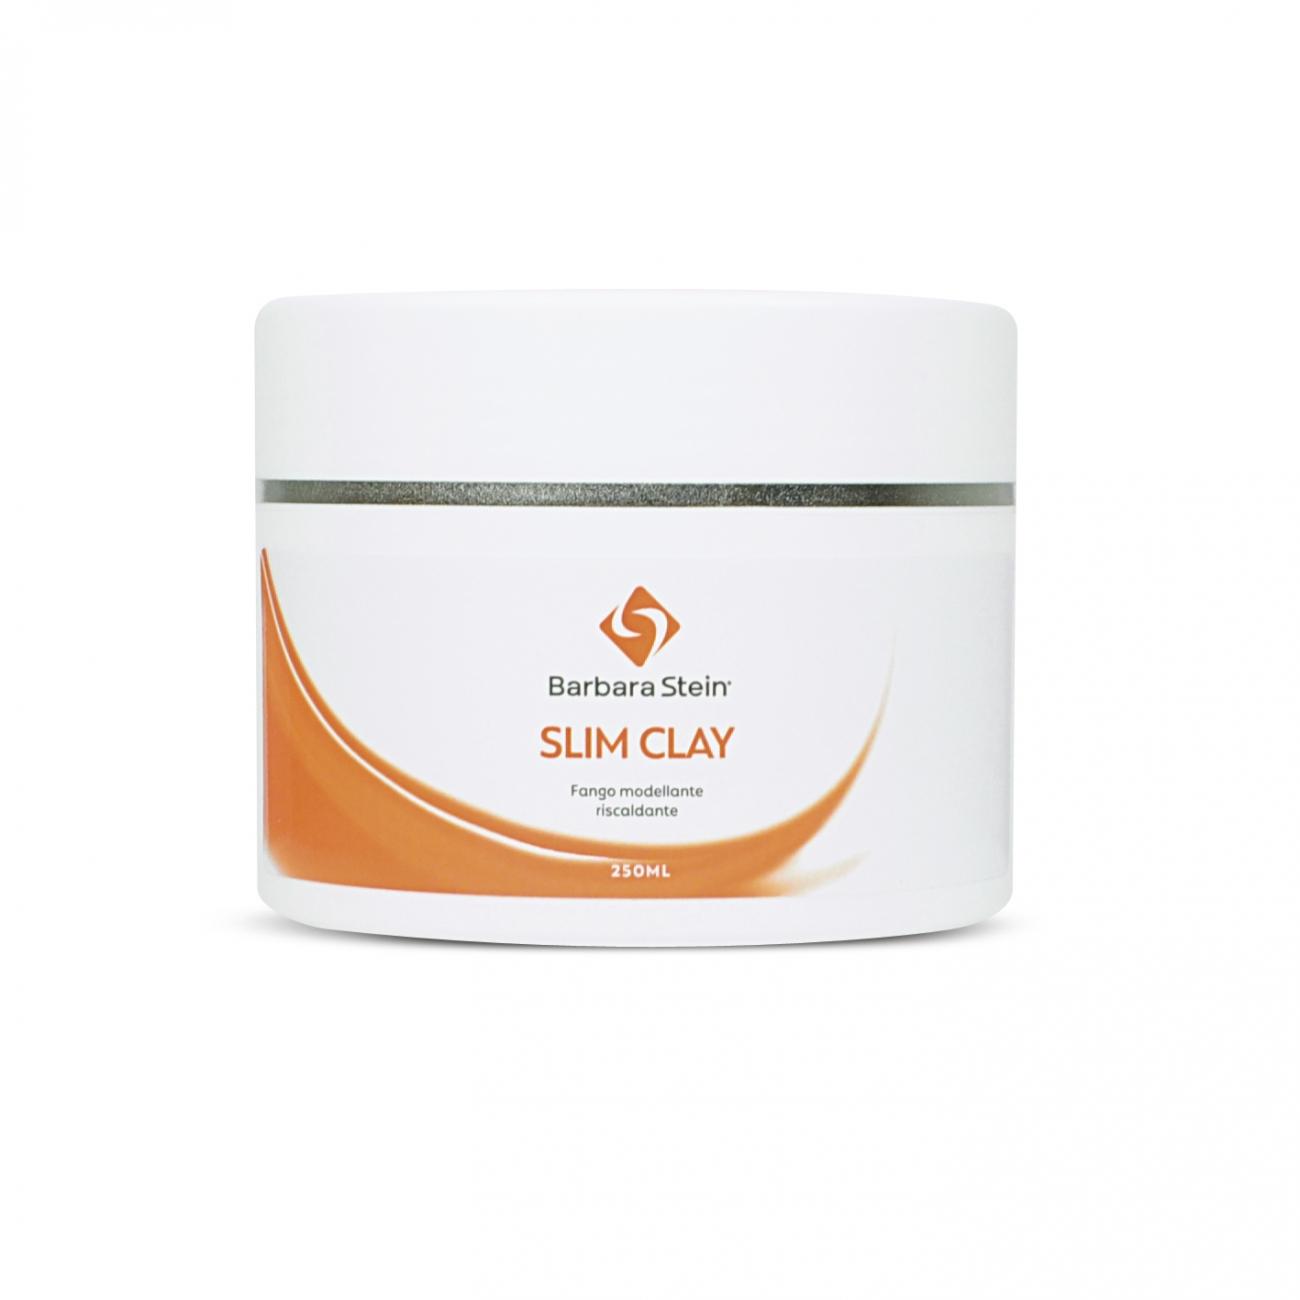 SLIM CLAY (250 ml)